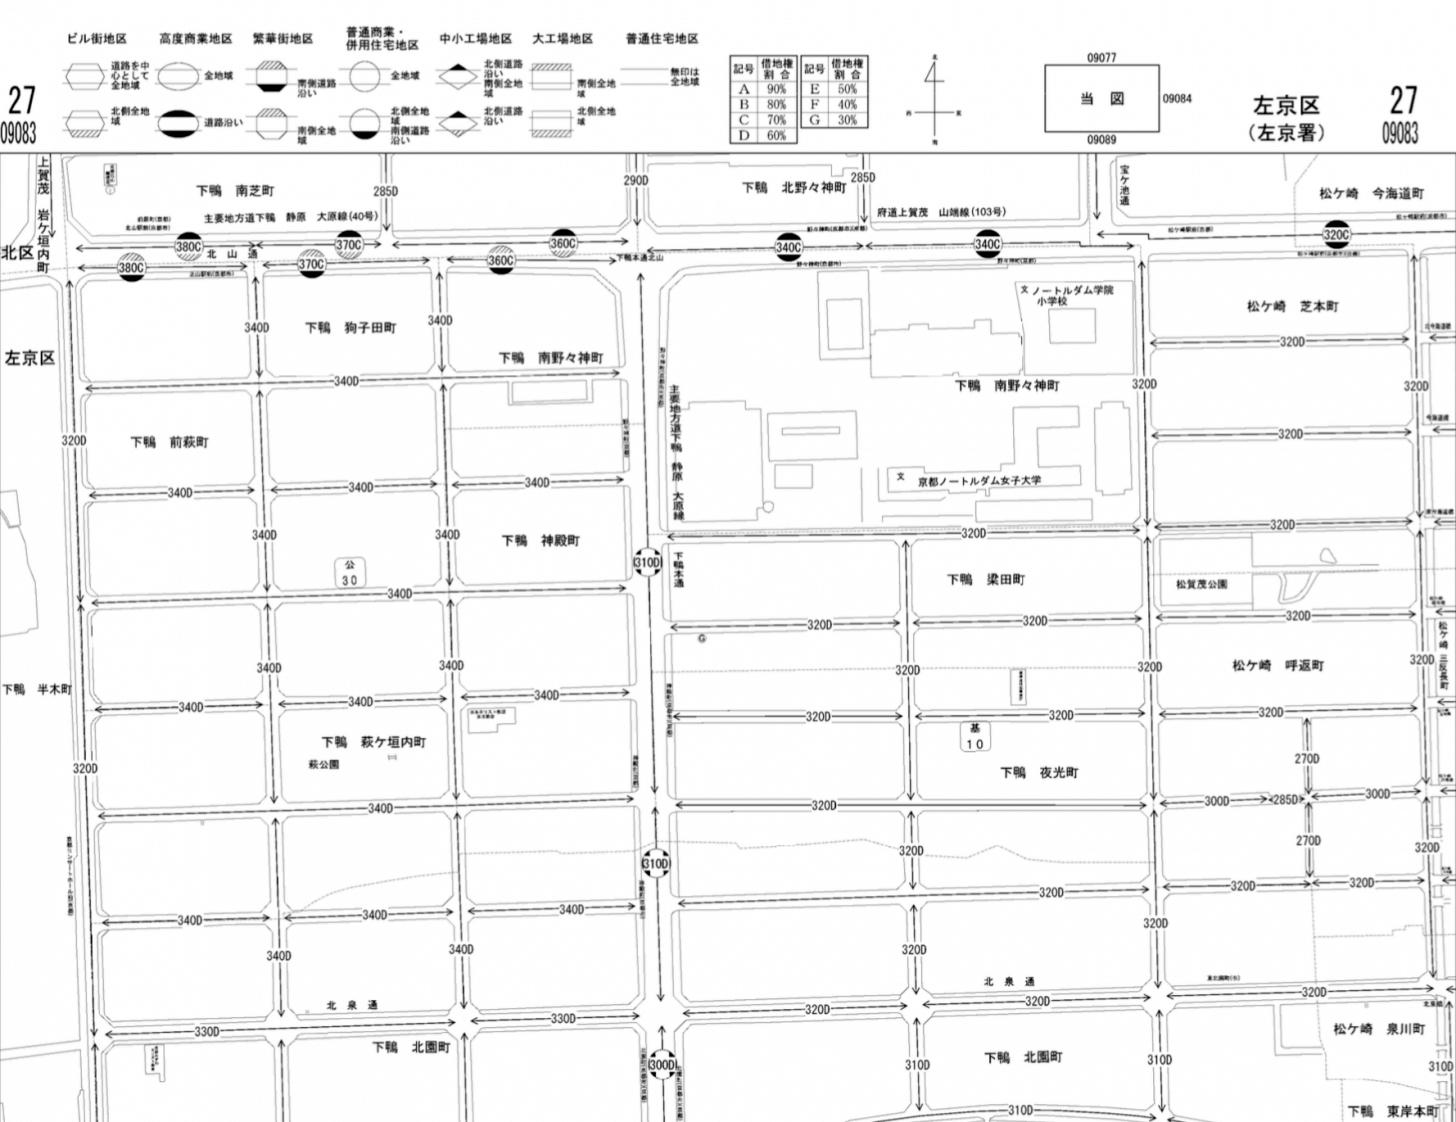 事務所周辺の路線価図